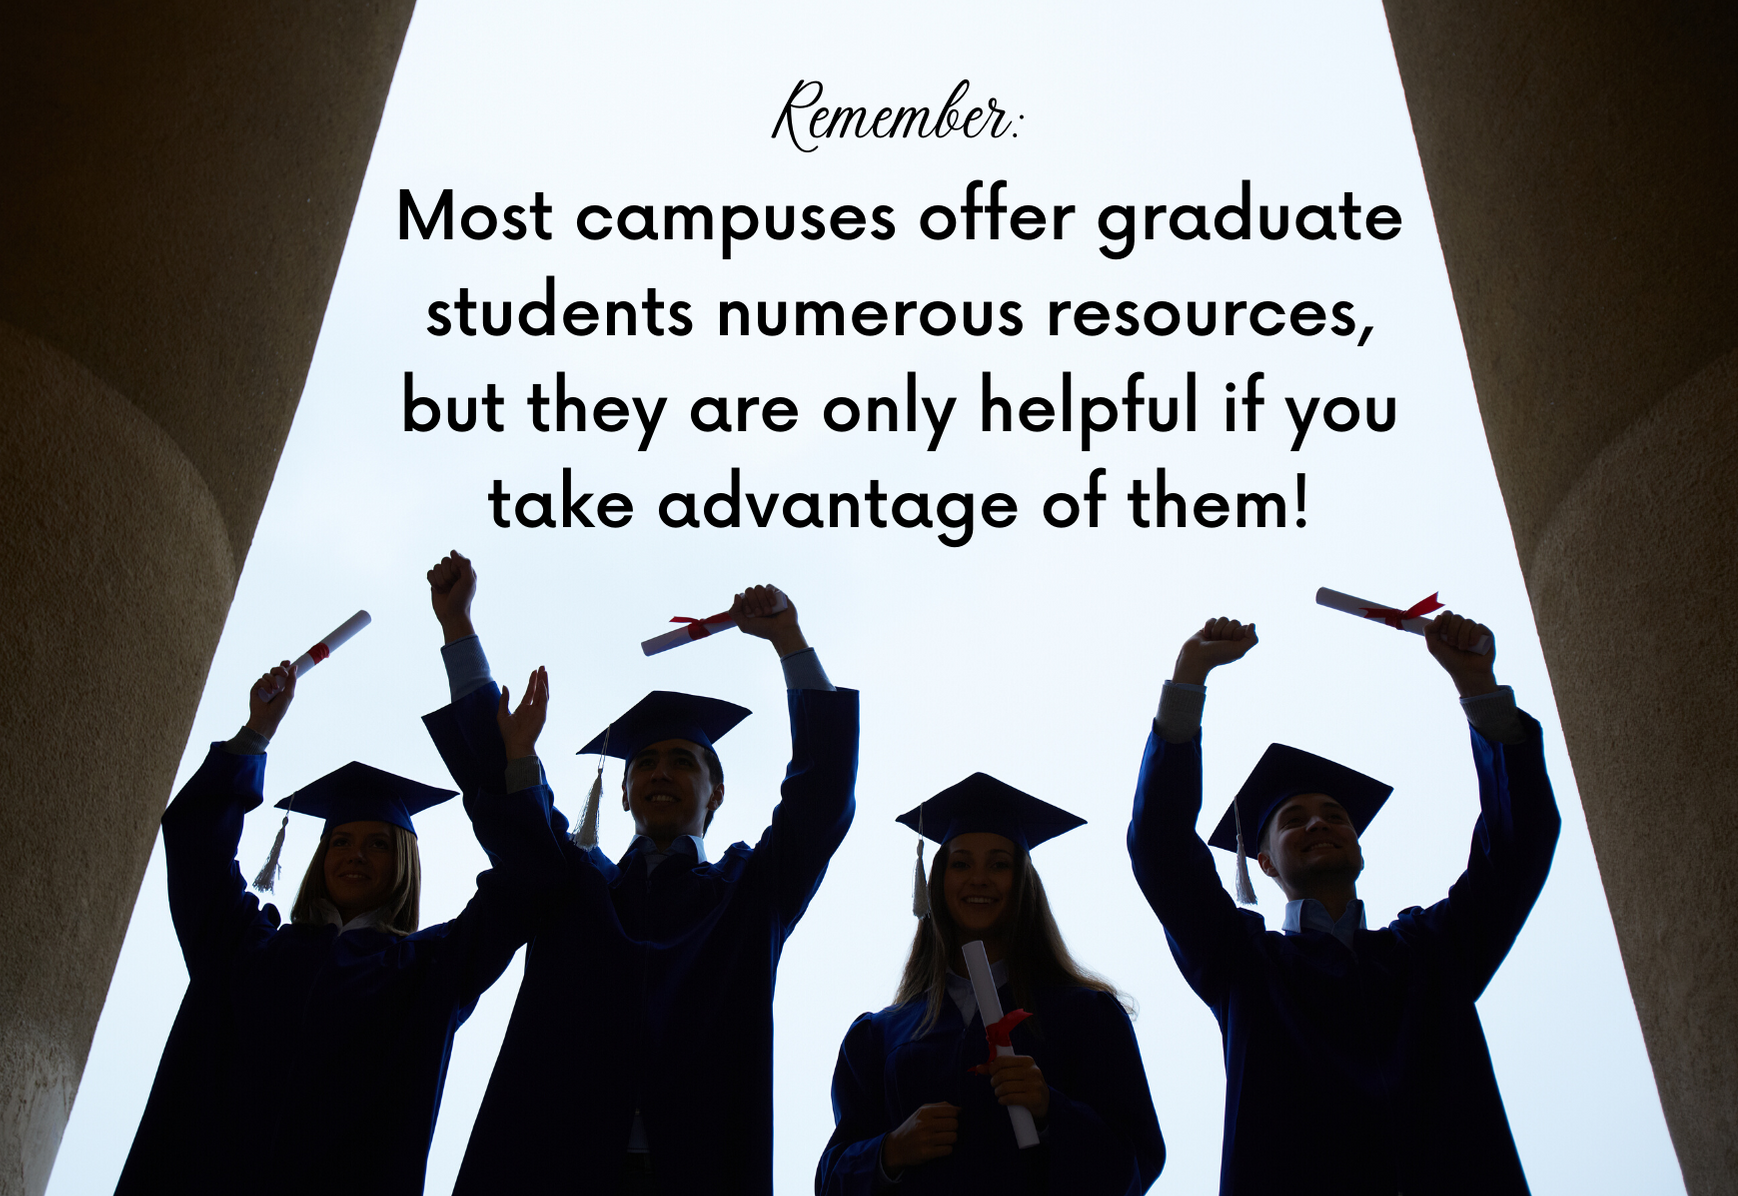 campus resources fact 2